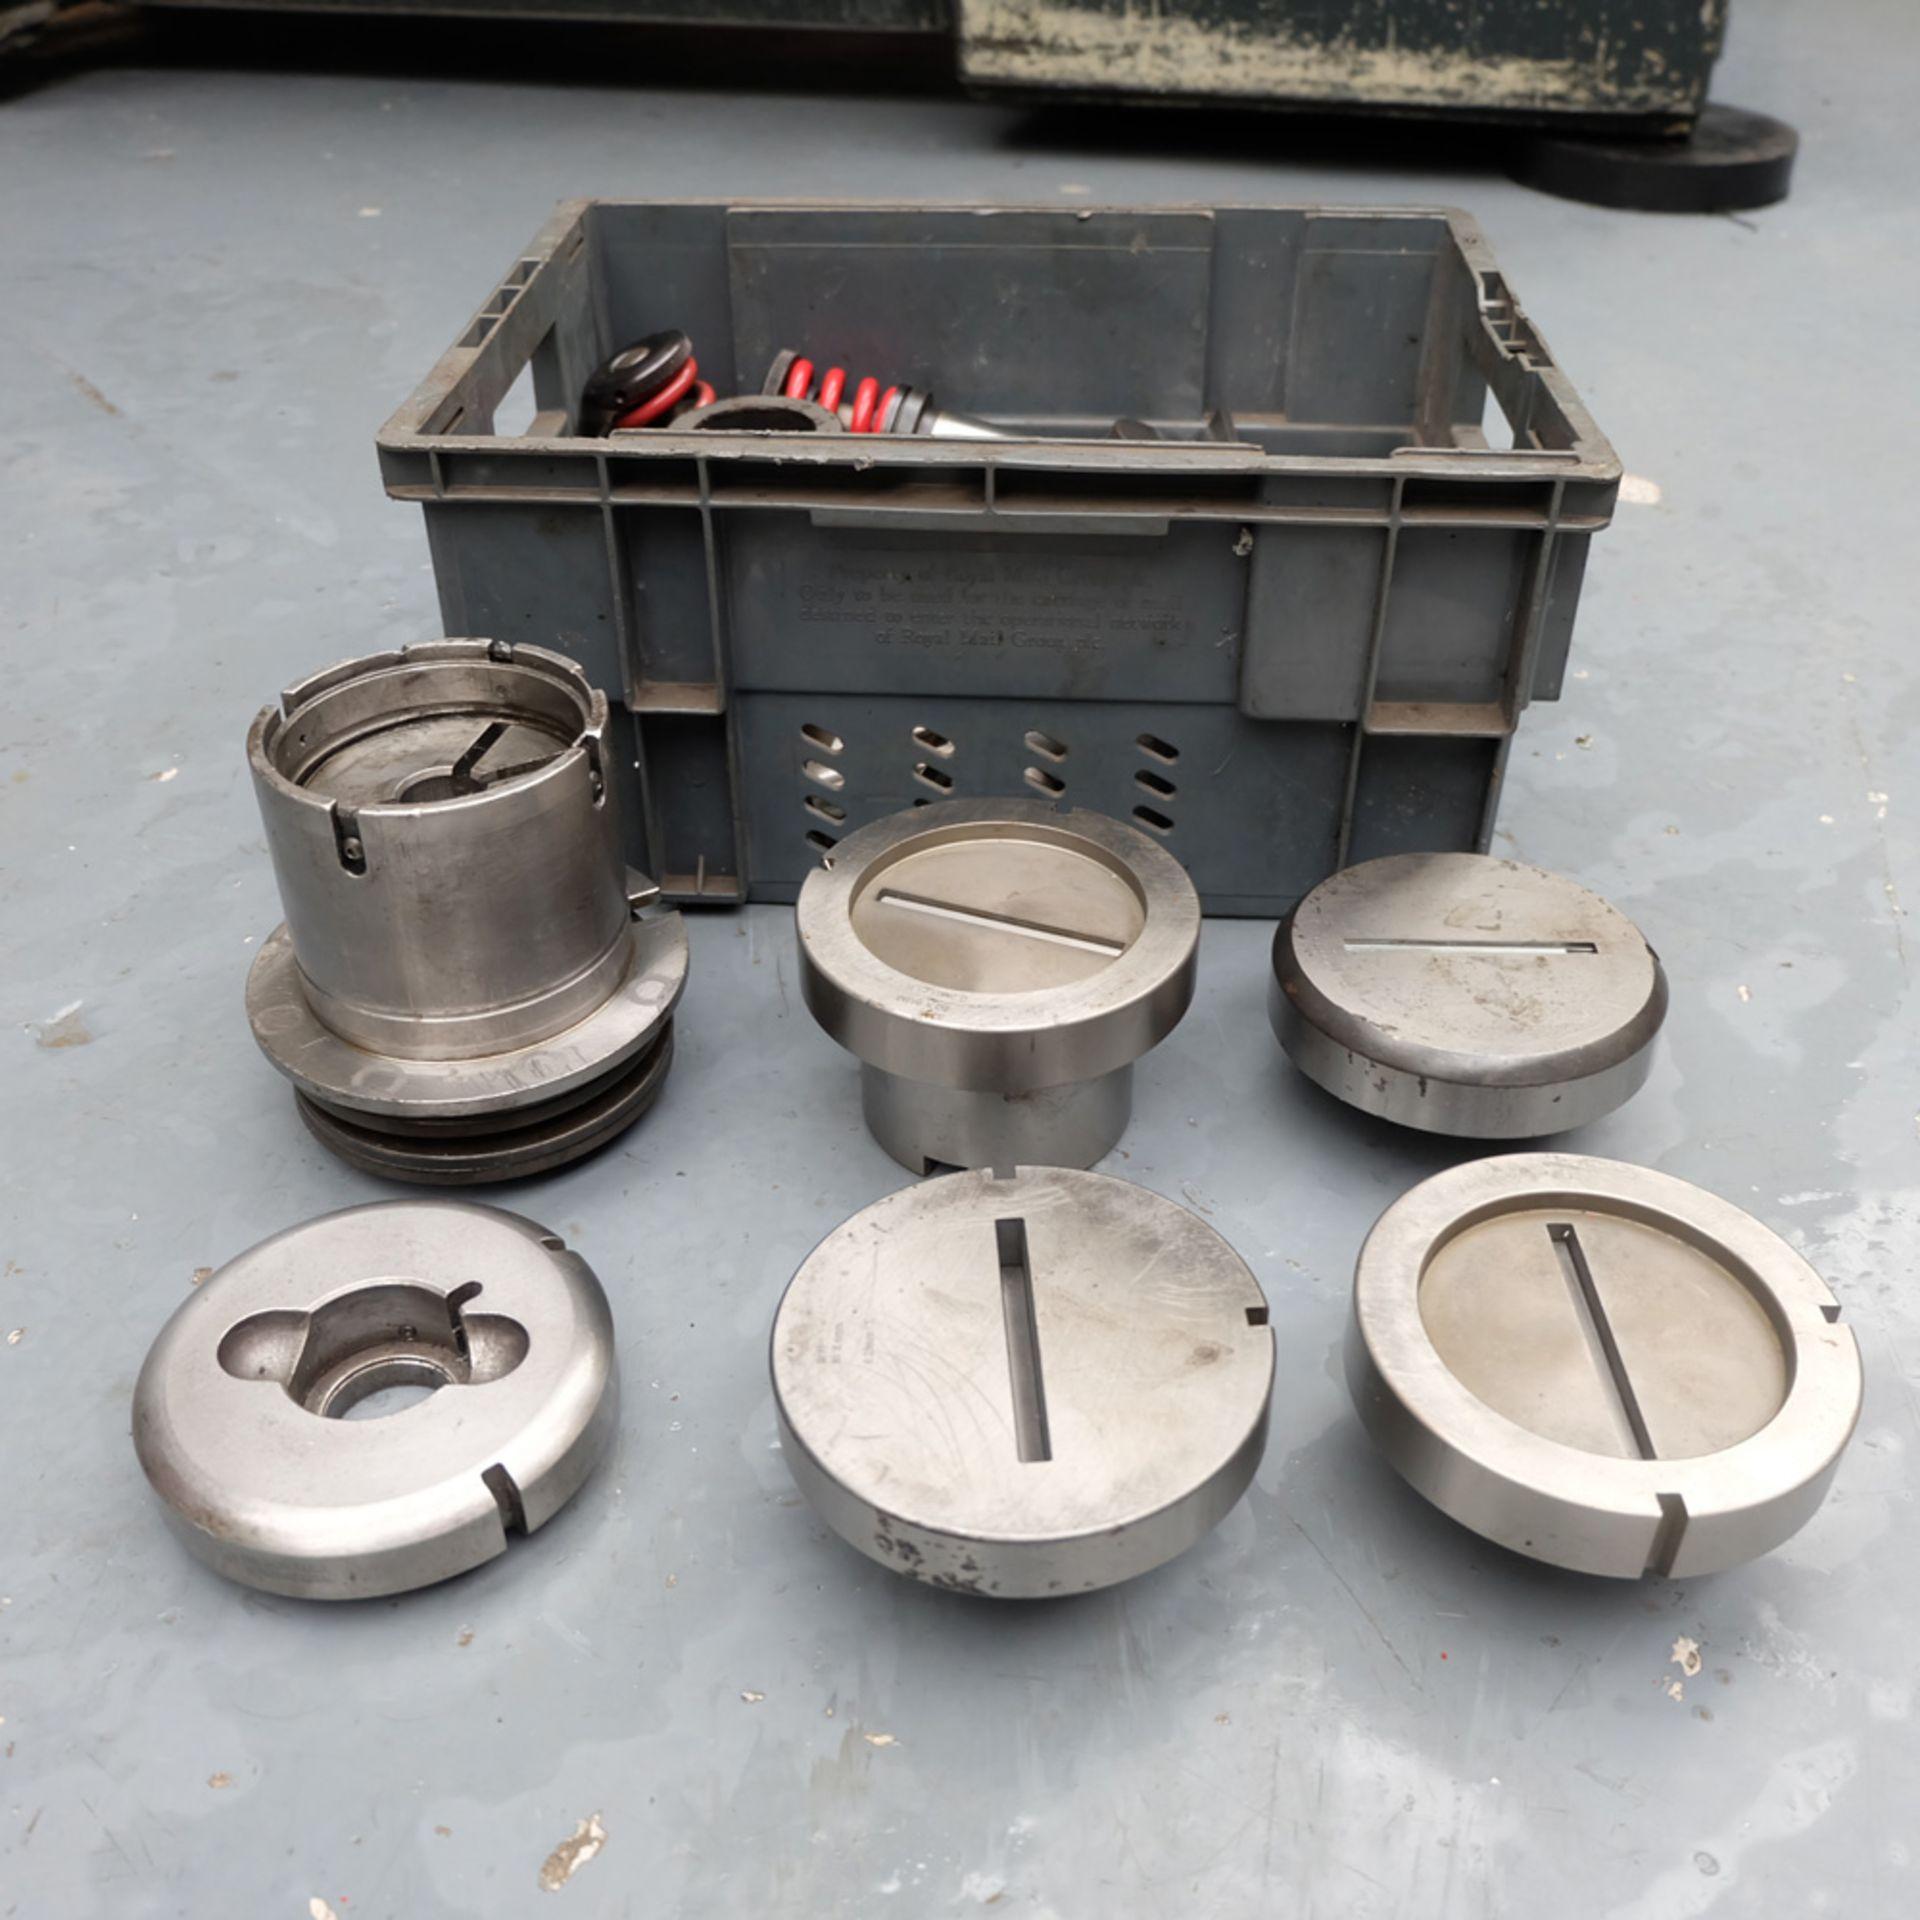 LVD Shape Delta 1000 Thick CNC Turret Punching Machine. - Image 17 of 18